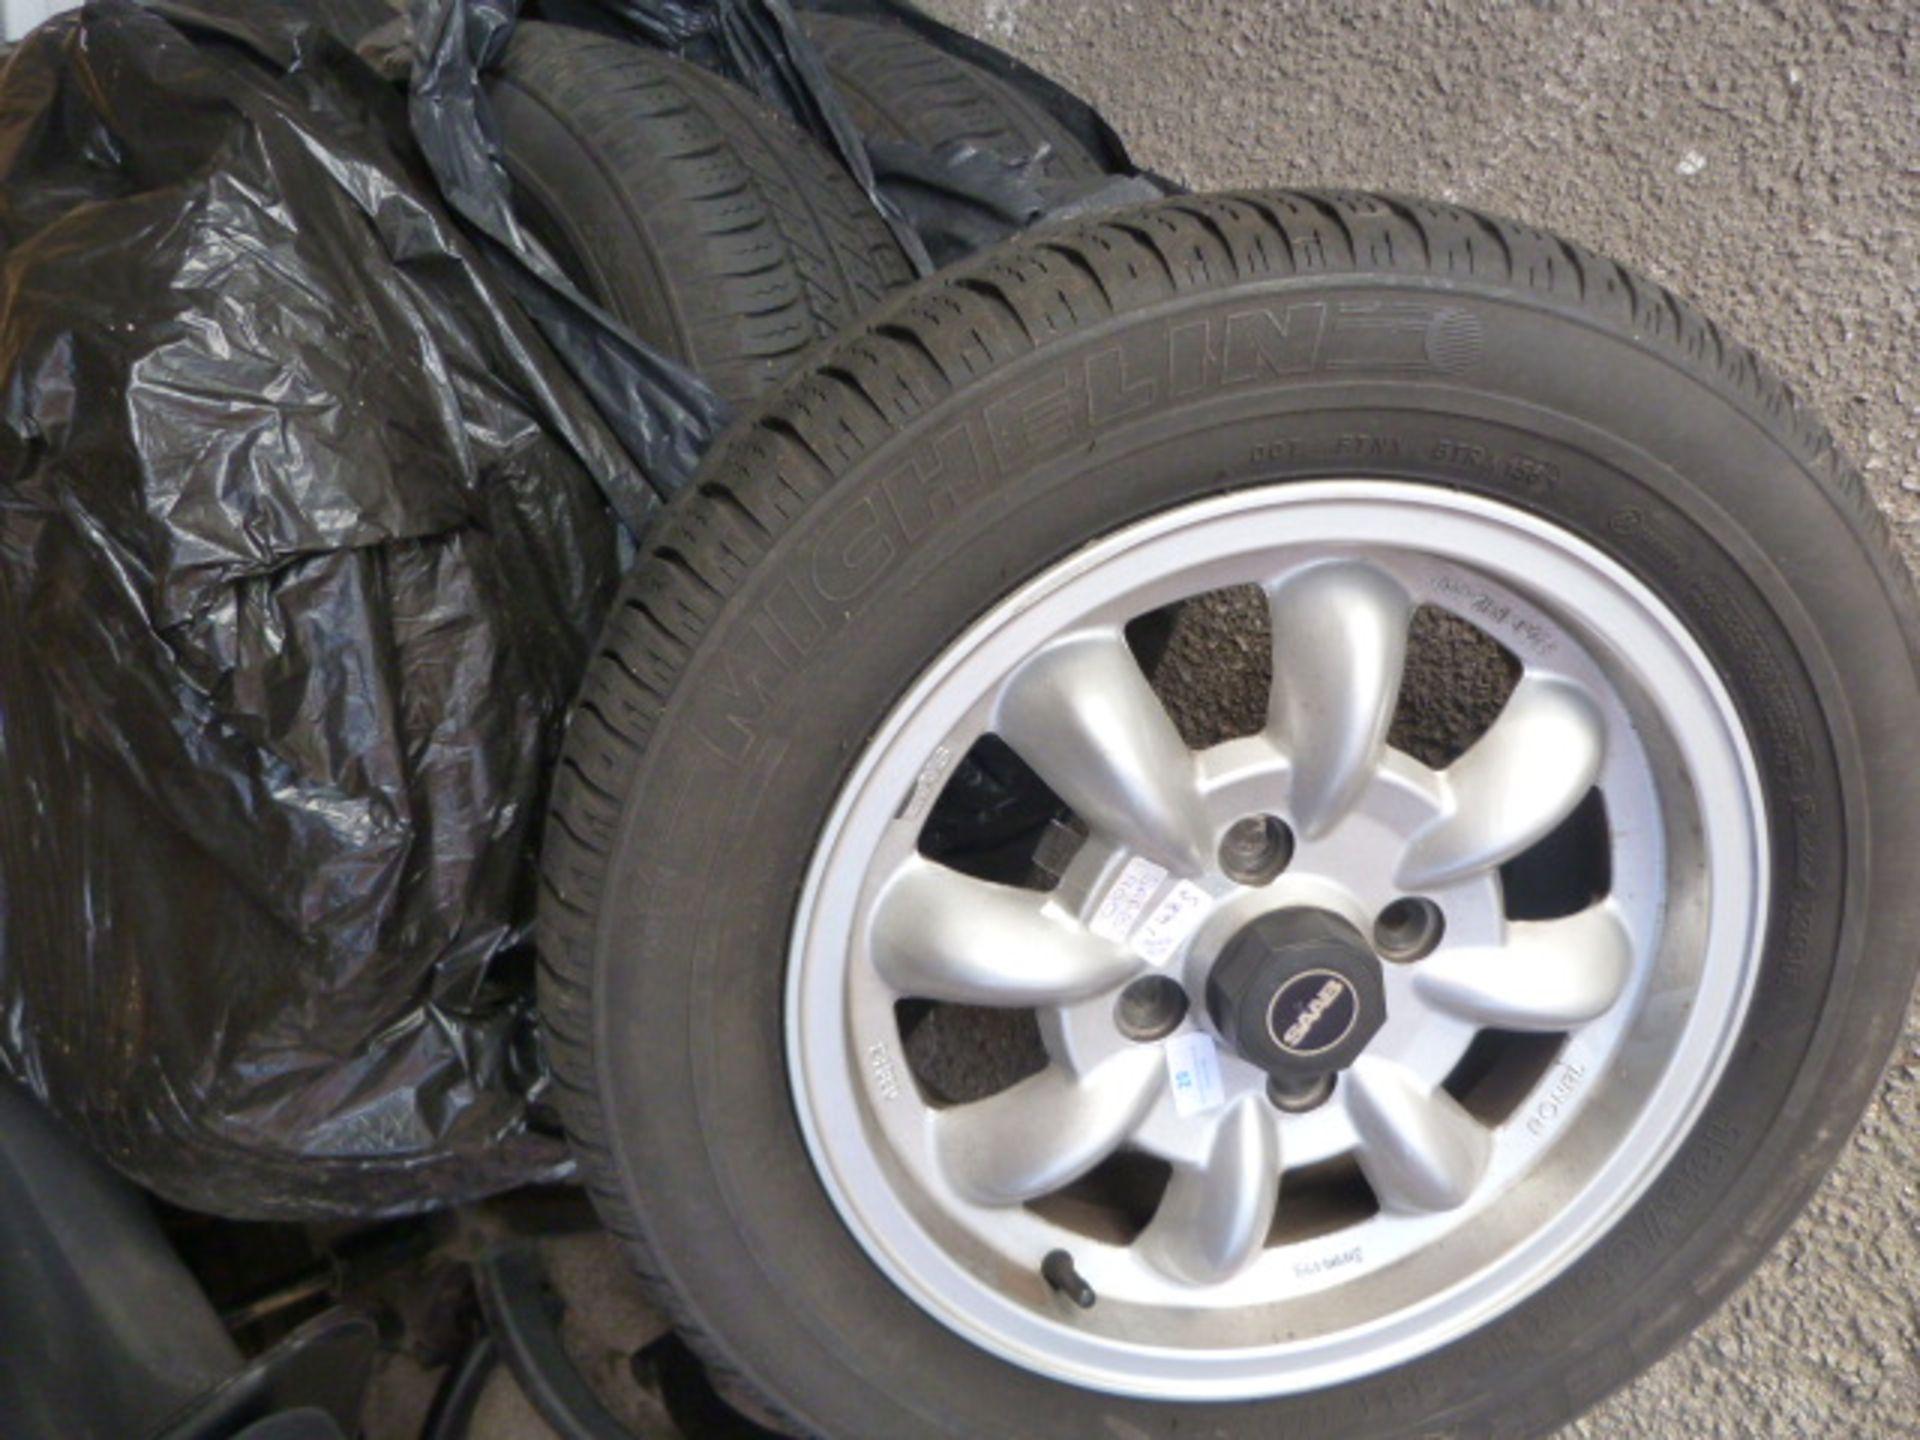 Lot 29 - Set of Four Saab 900 185/65R15 Tyres on Wheels